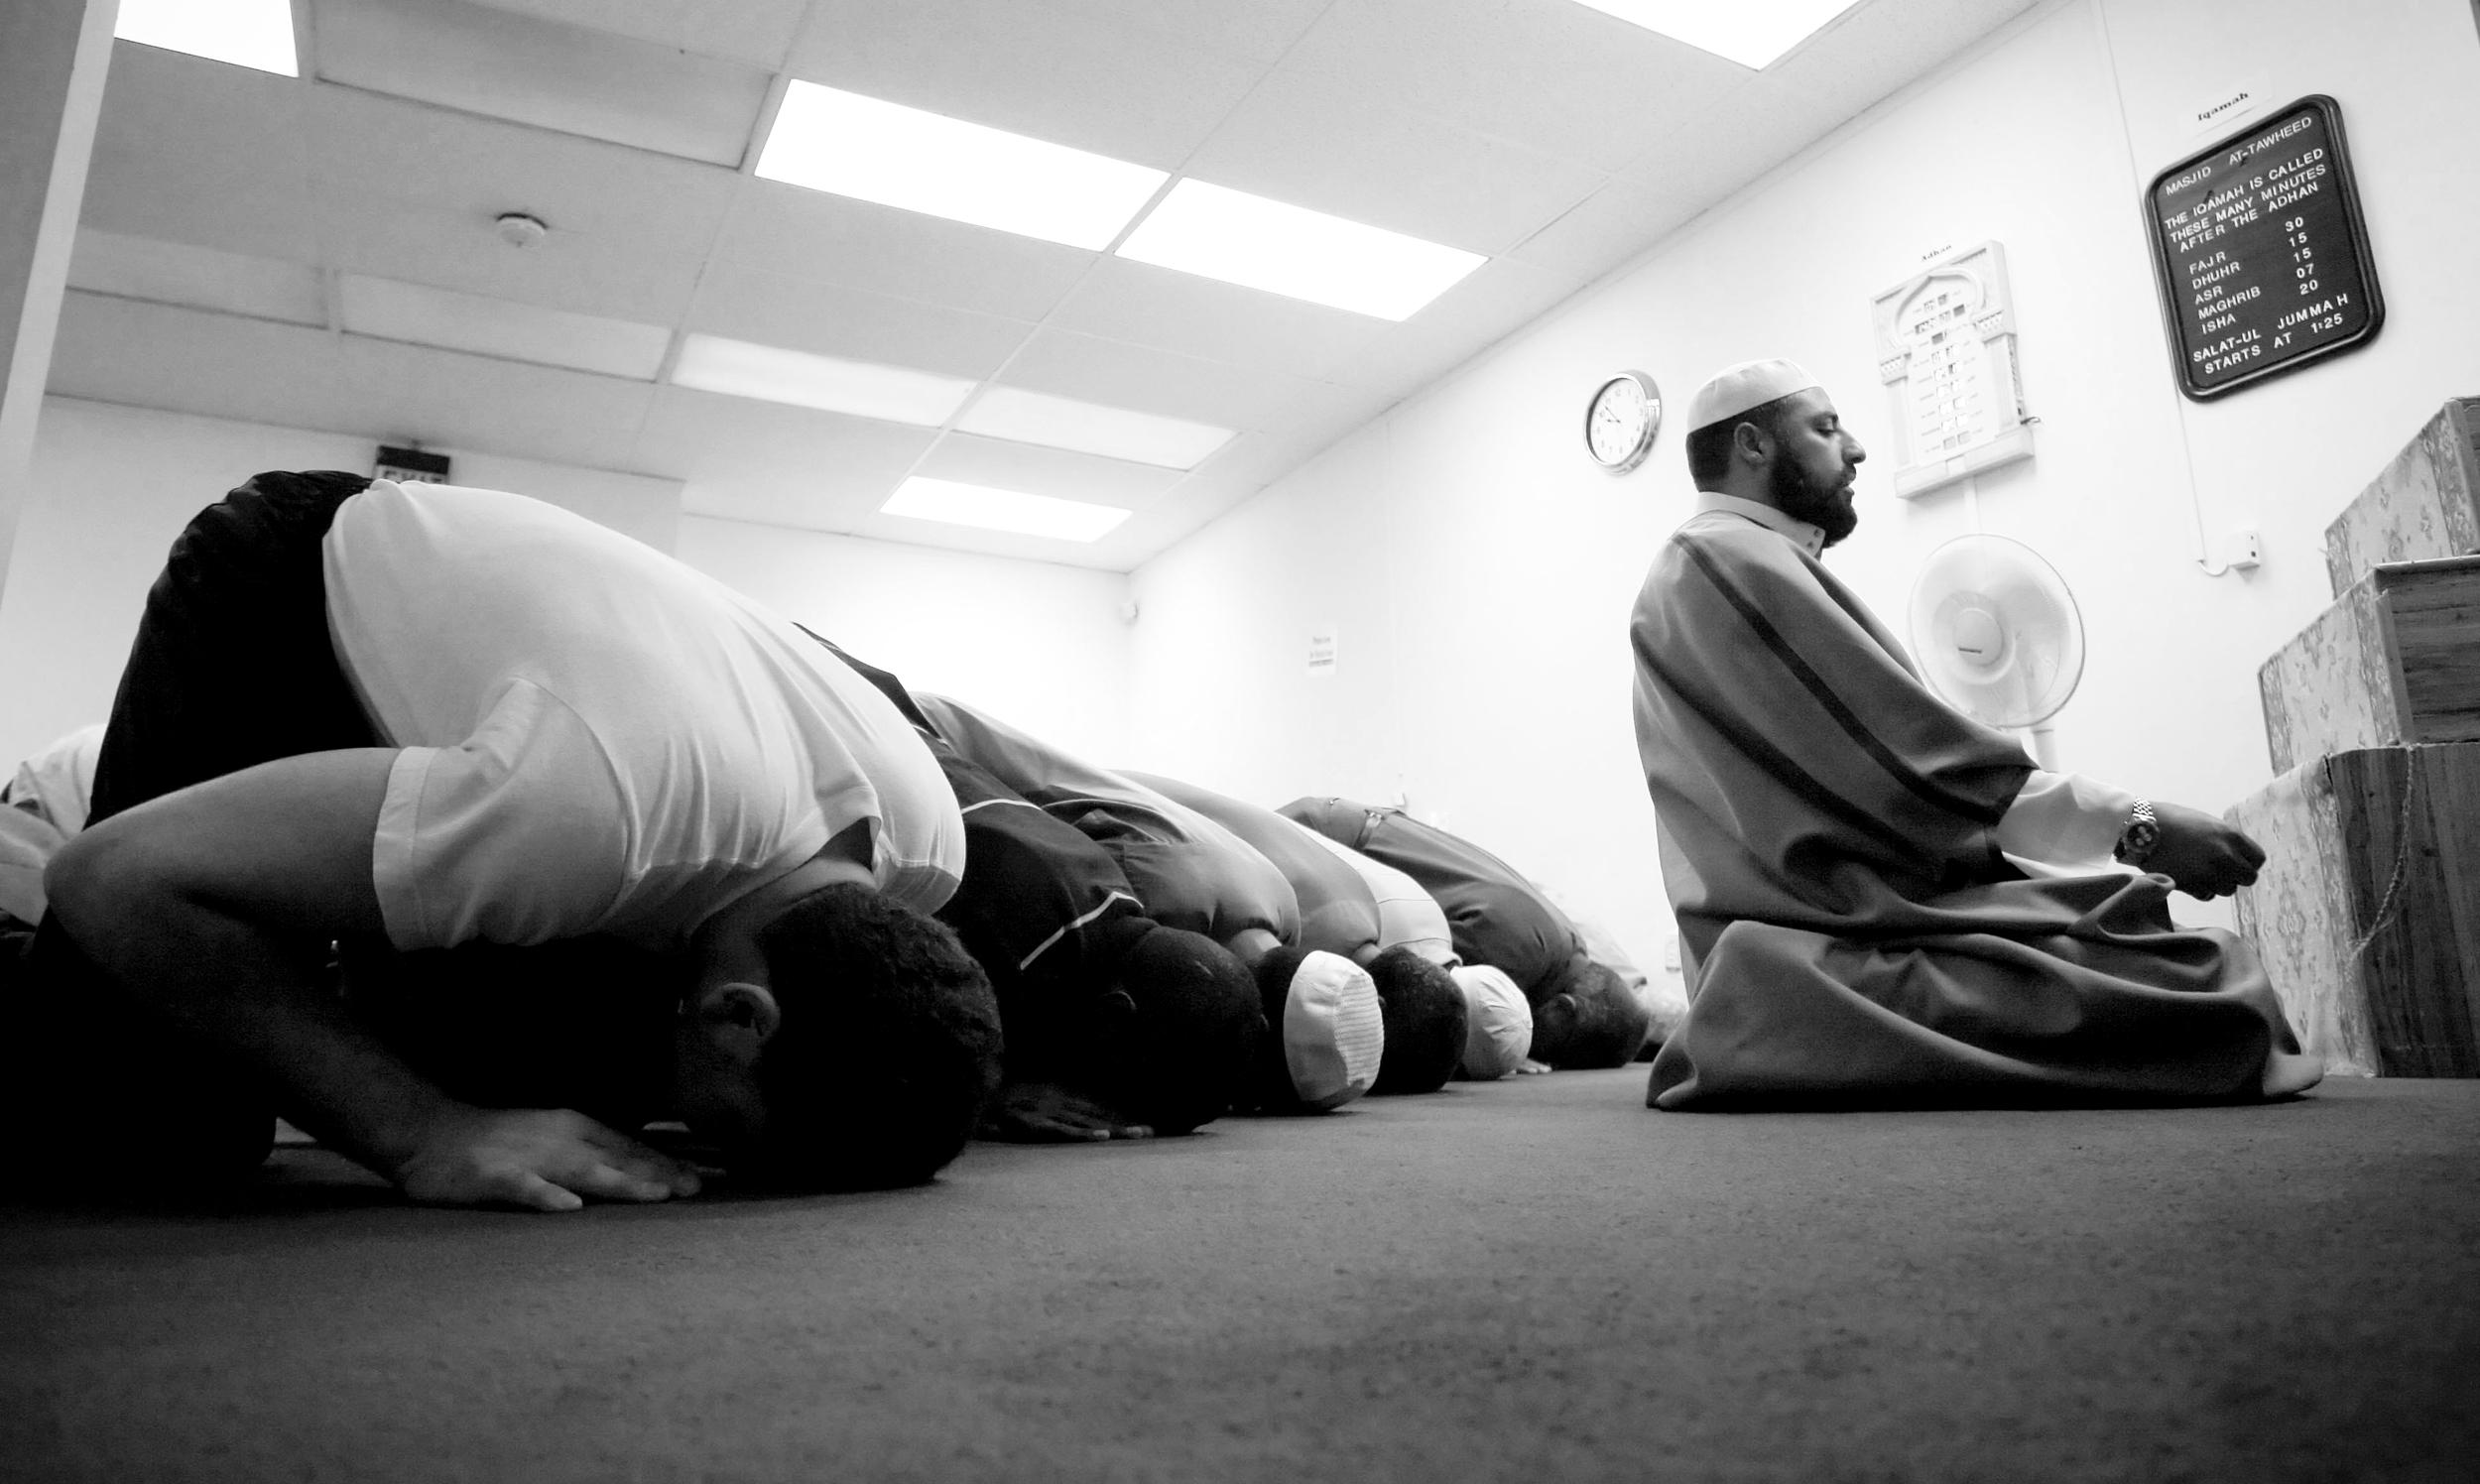 Muslim men praying in a mosque